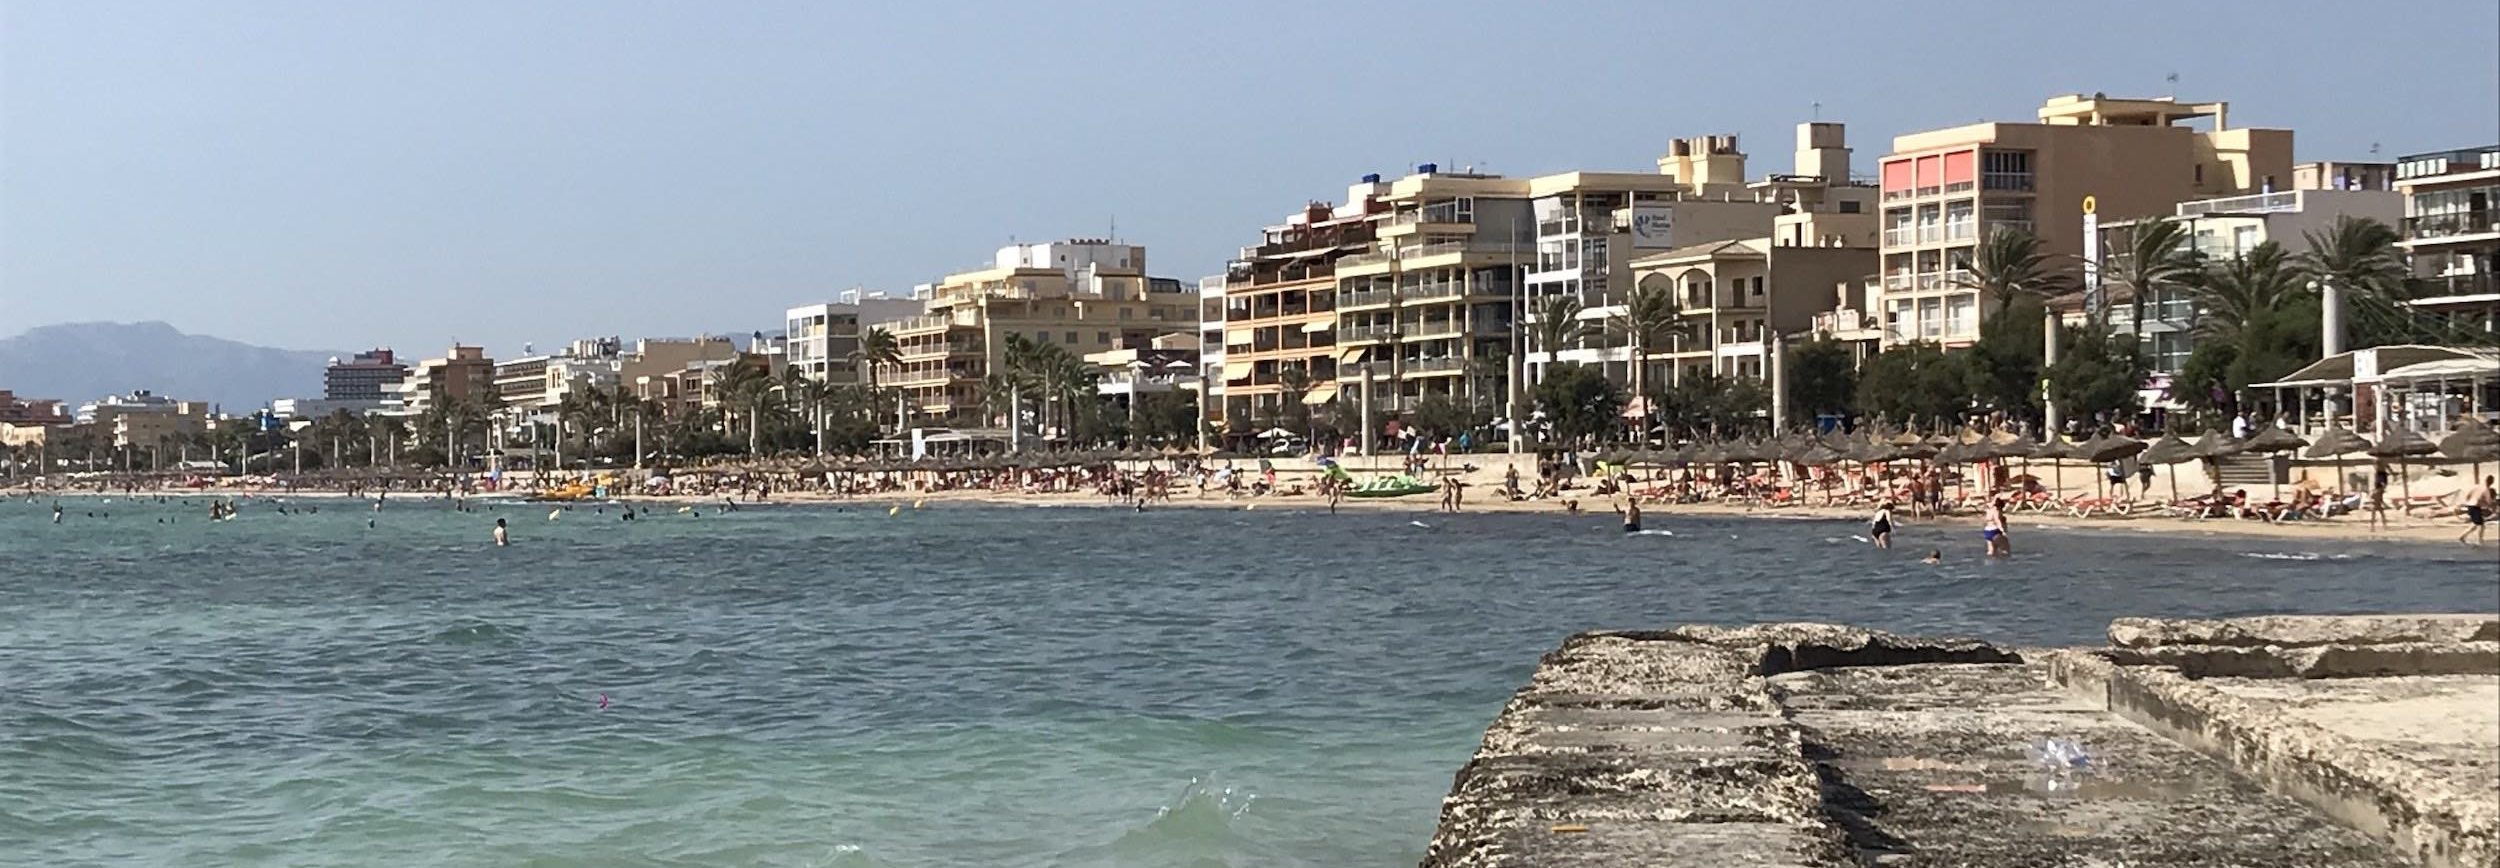 Palma-Bucht-Mallorca